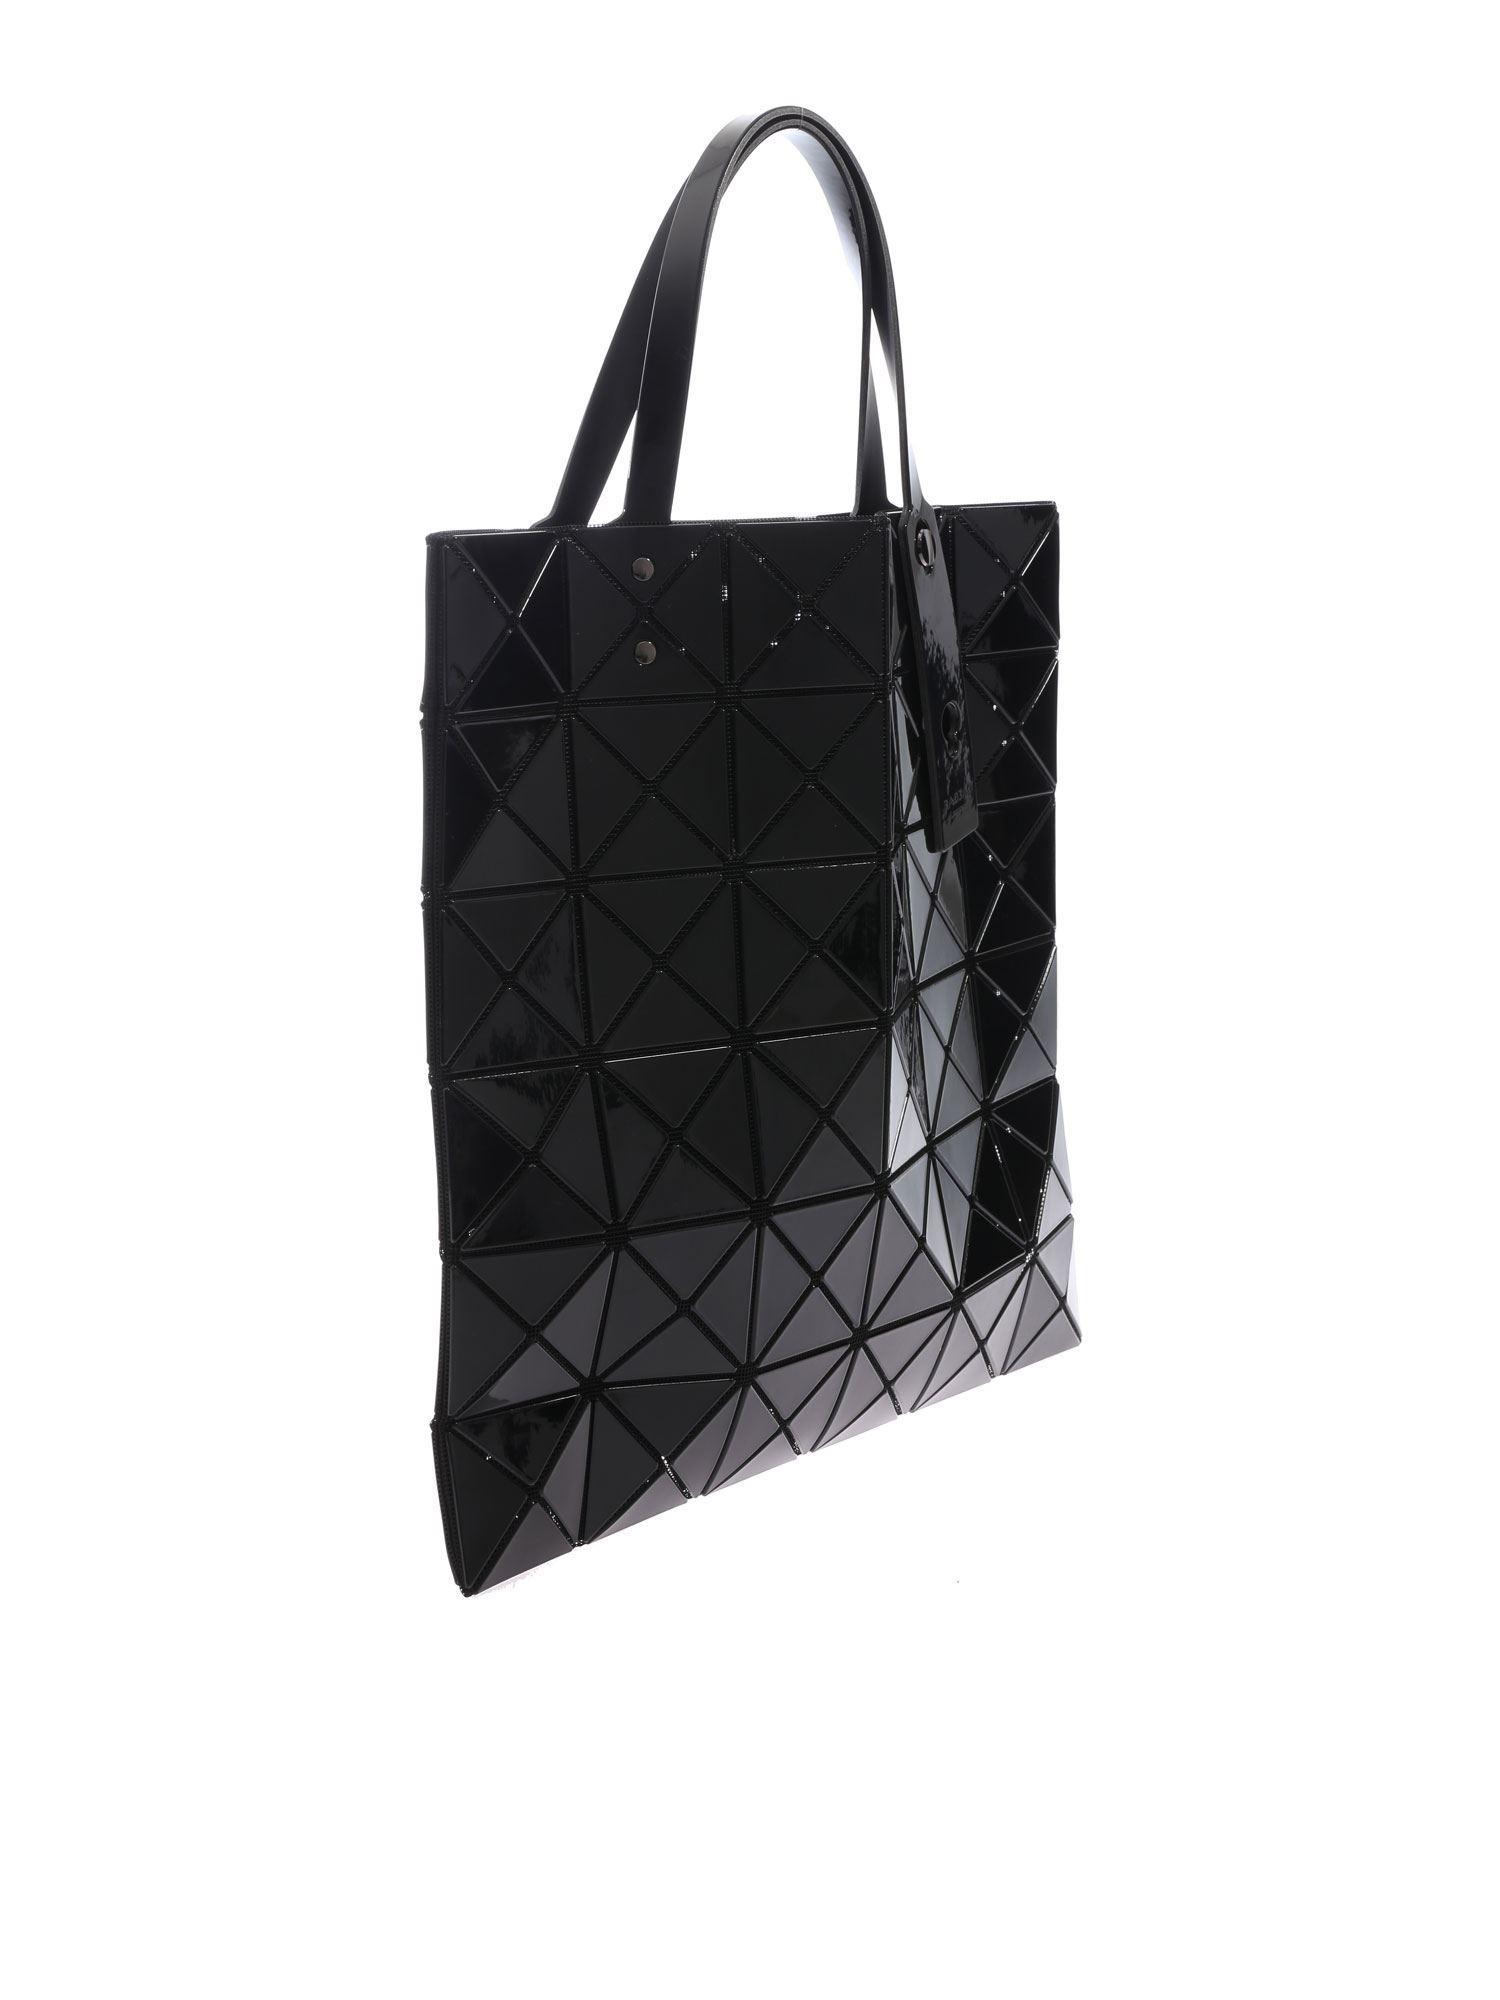 15675f31e8 Bao Bao Issey Miyake - Lucent Black Bag With Triangular Pattern - Lyst.  View fullscreen